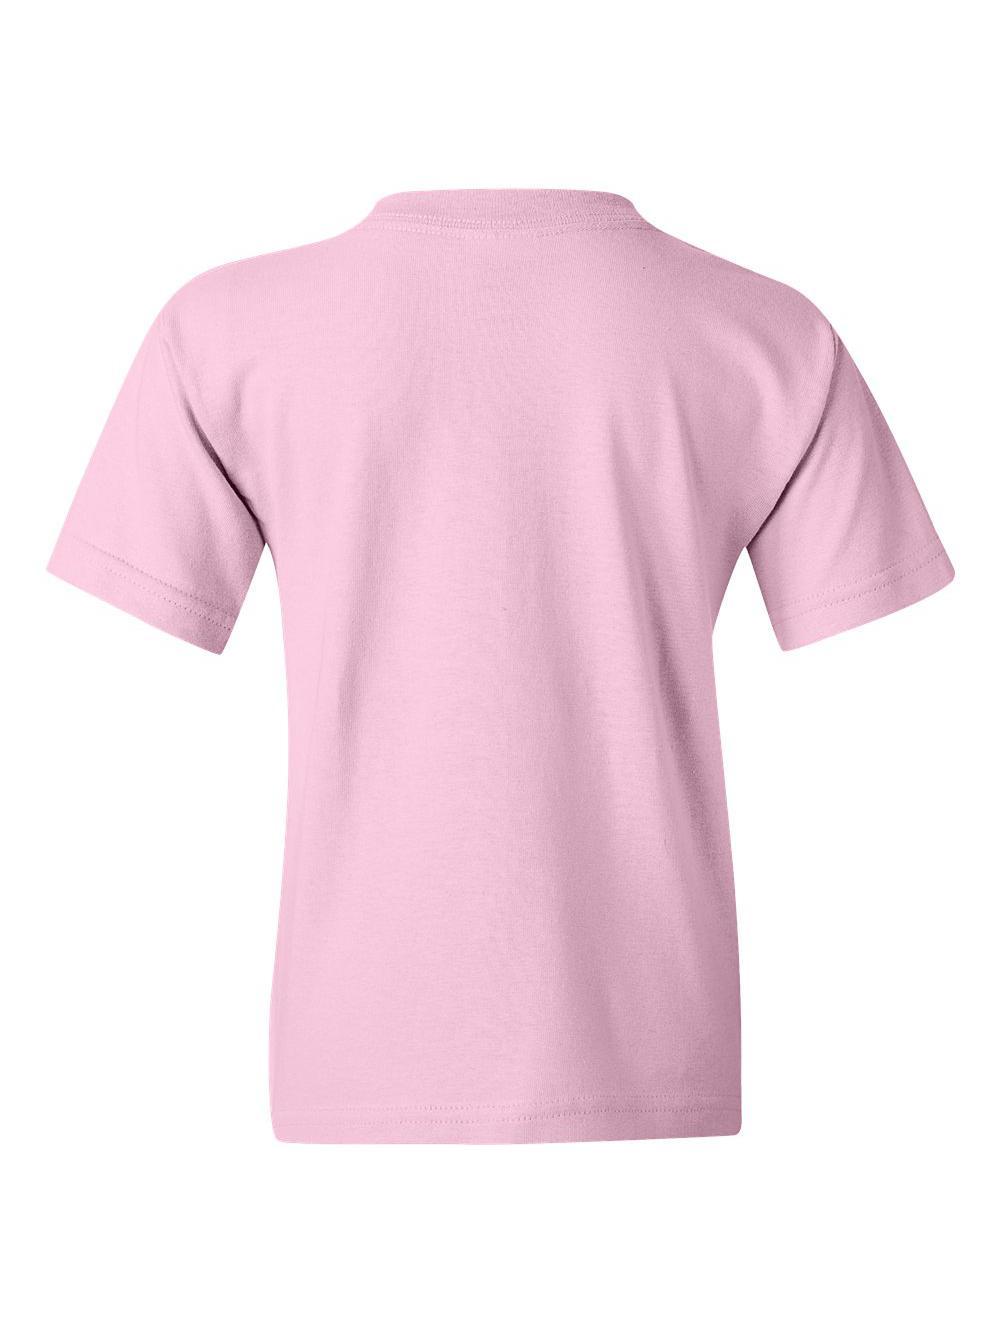 Gildan-Heavy-Cotton-Youth-T-Shirt-5000B thumbnail 73